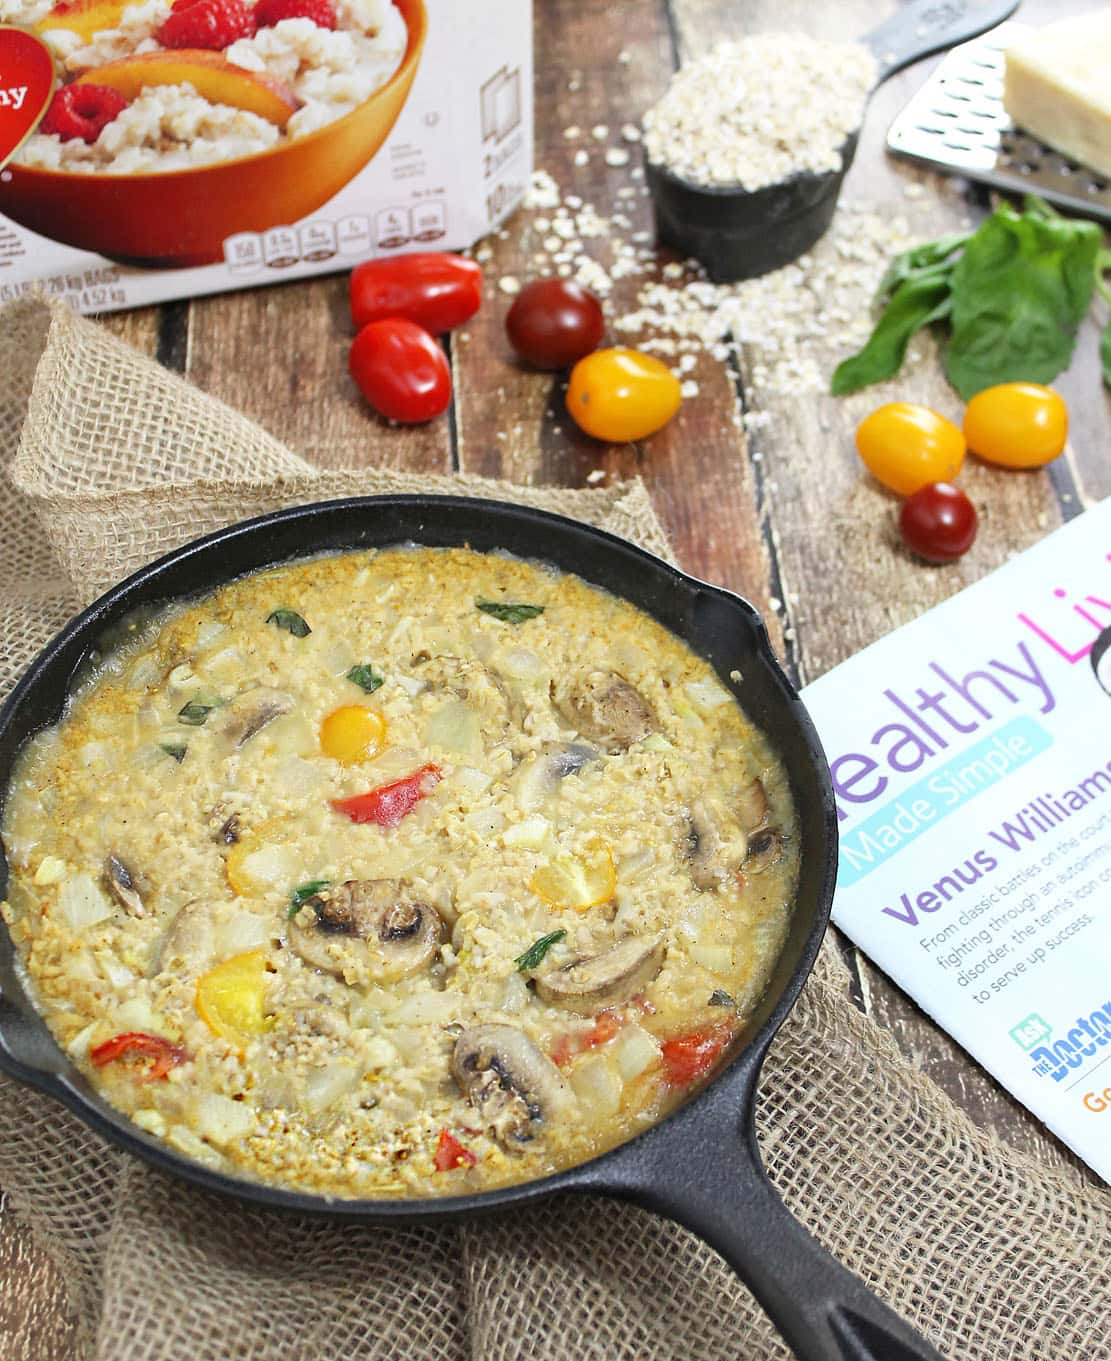 Tomato-Basil-Mushroom-Baked-Oatmeal-Risotto-@RunninSrilankan-#SamsClubMag